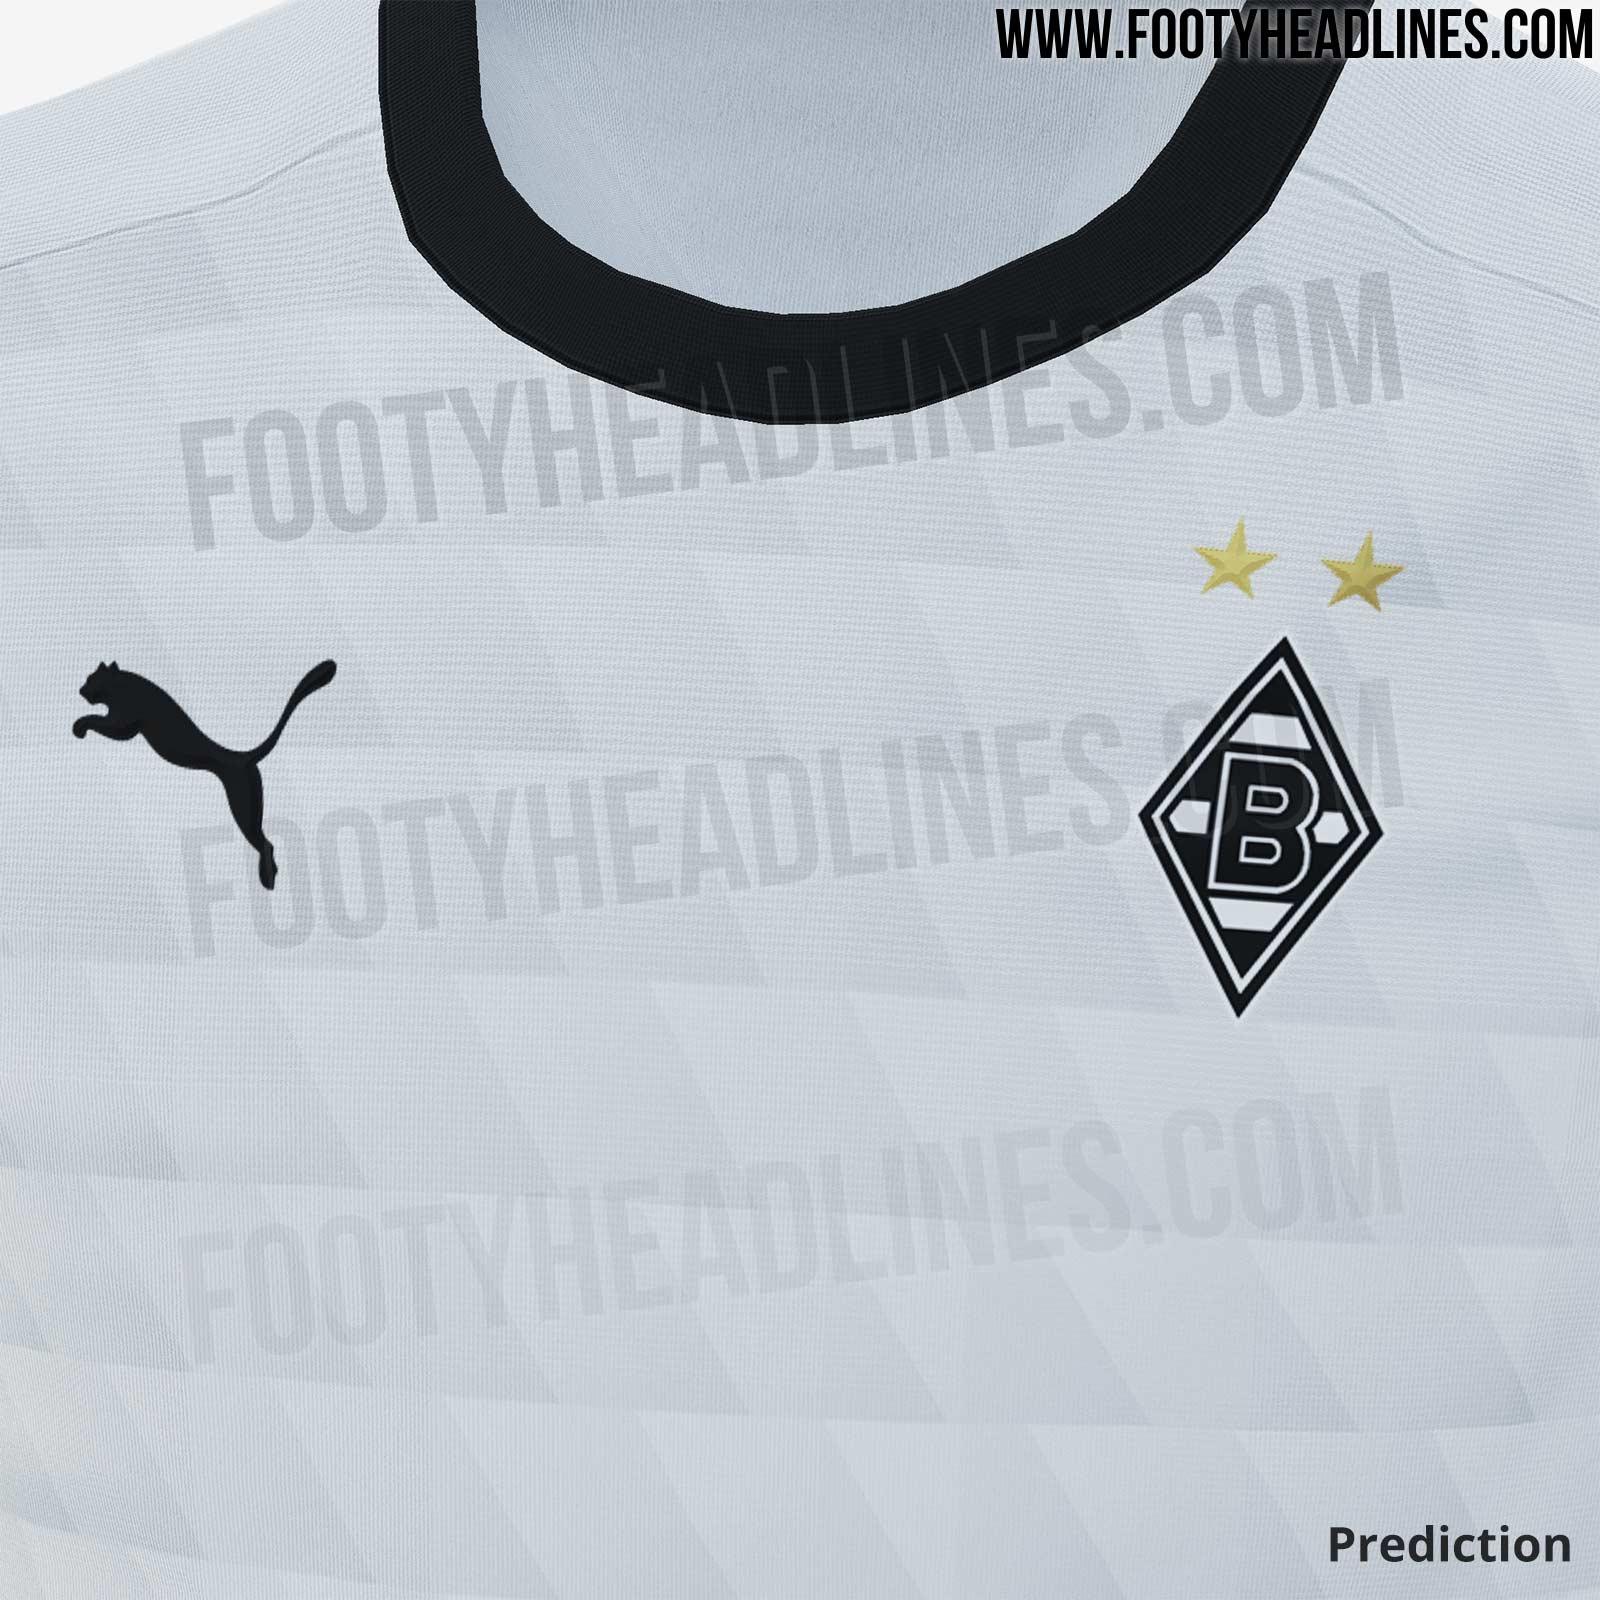 Gladbach Kit 20/21 / Gladbach 20-21 Away / Champions League Kit Released ... - Pes 2017 ...